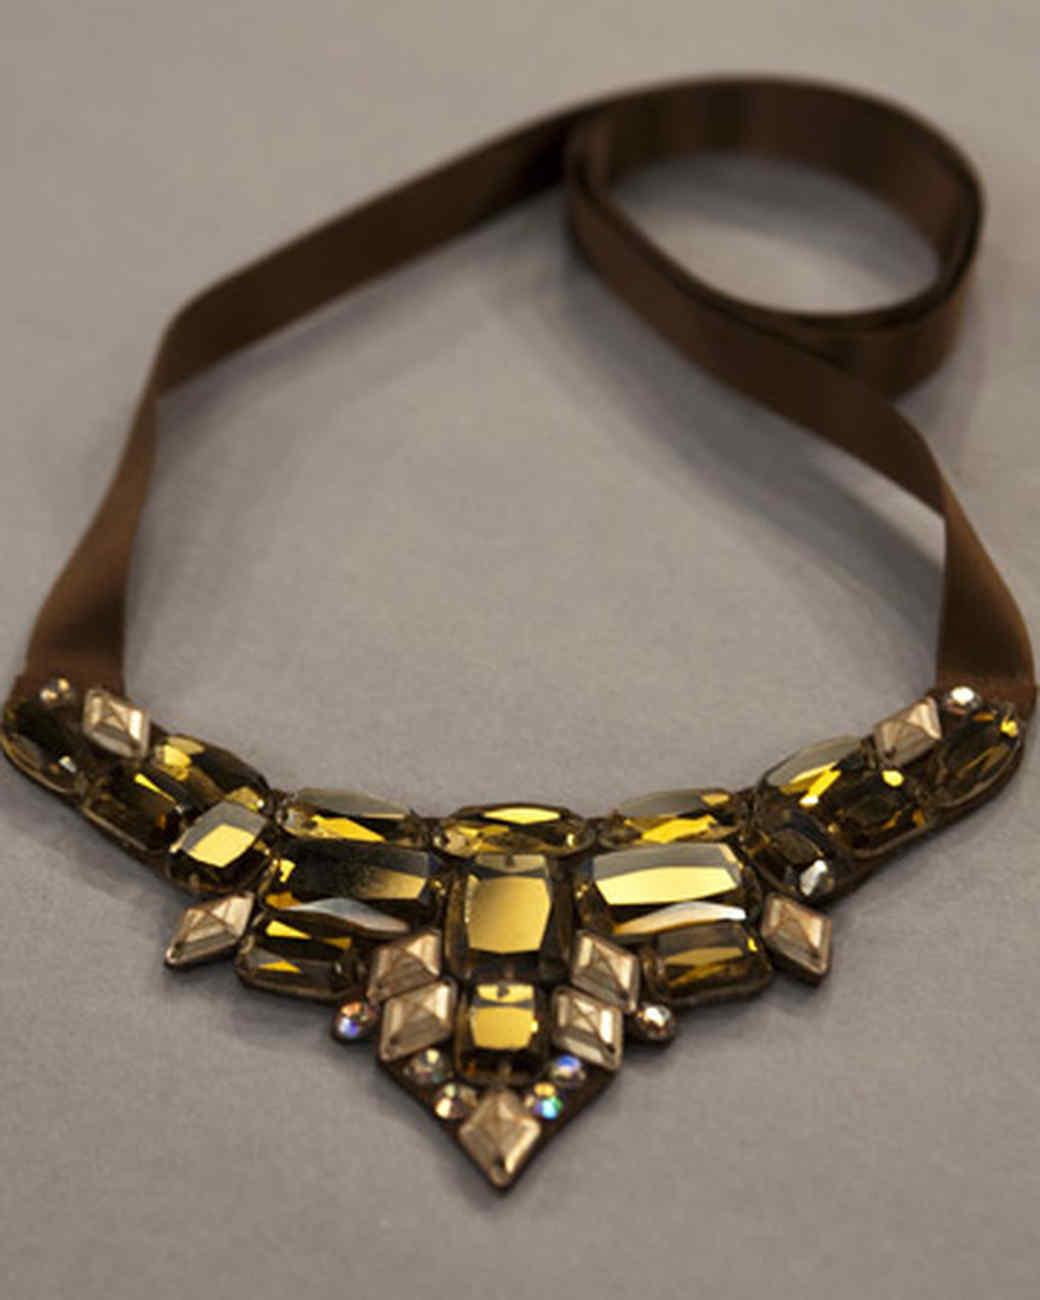 Original jewelry handmade: bracelets of ribbons 15